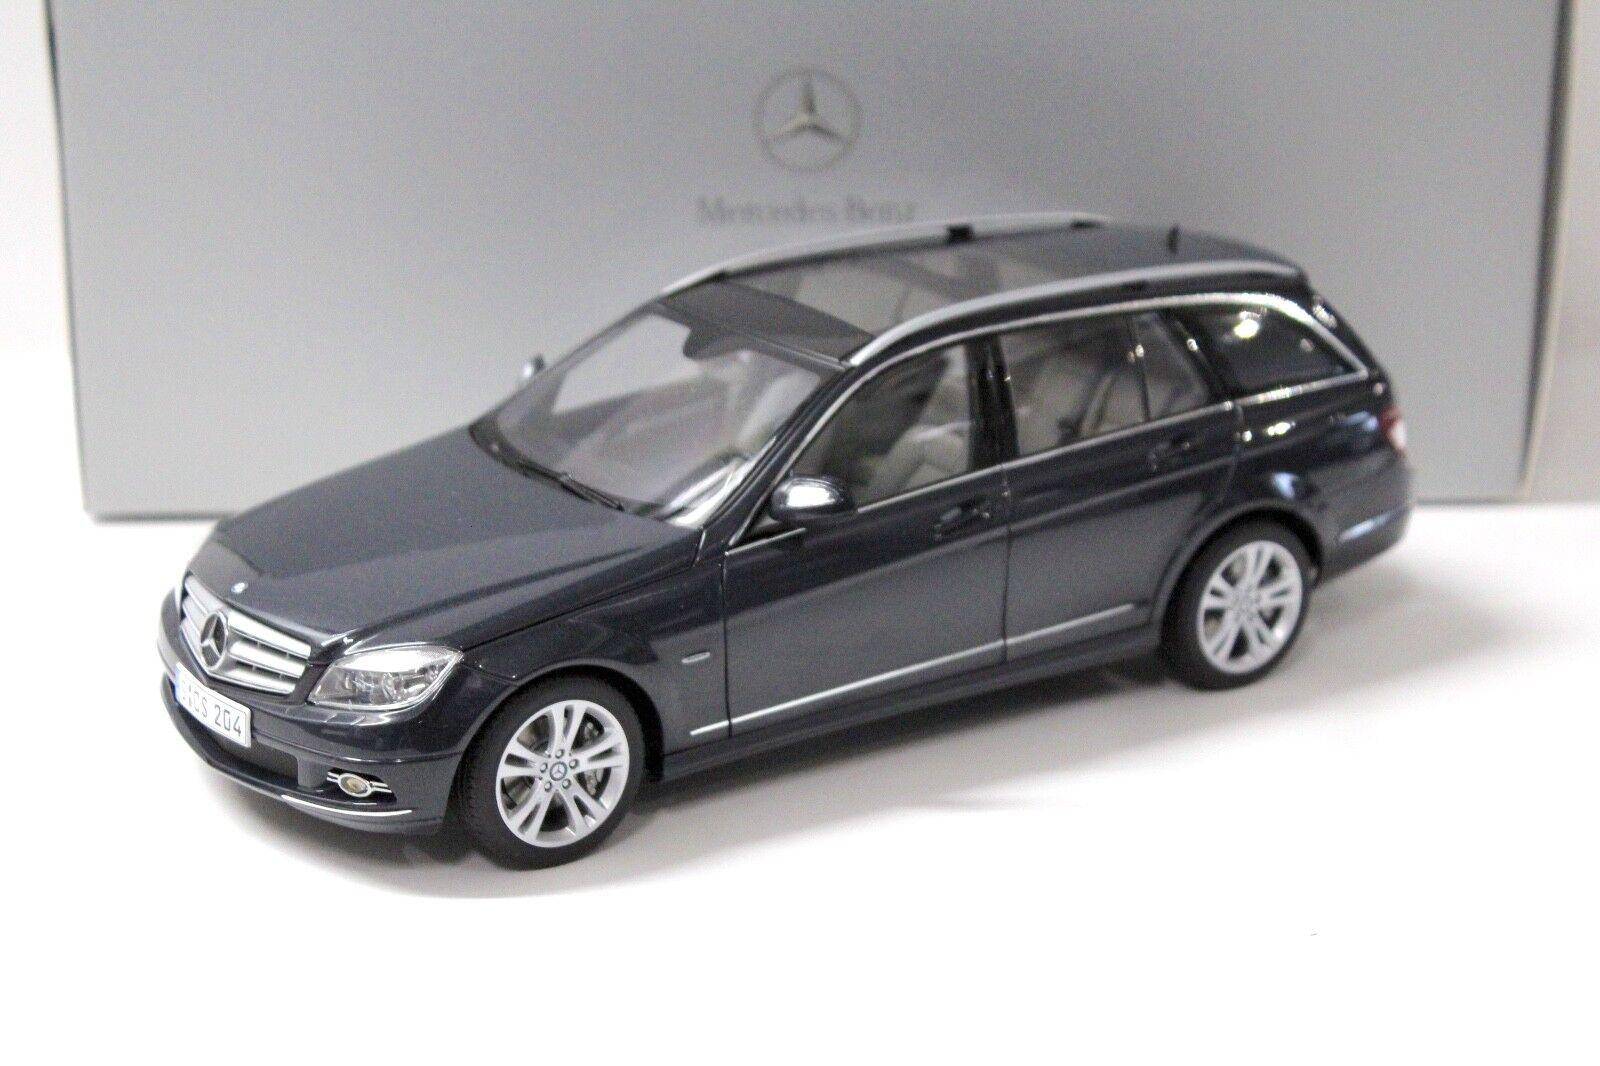 1:18 Autoart MERCEDES CLASSE C T-Modèle TENORIT Grey Dealer chez Premium-MODELCAR | Mode Attrayant